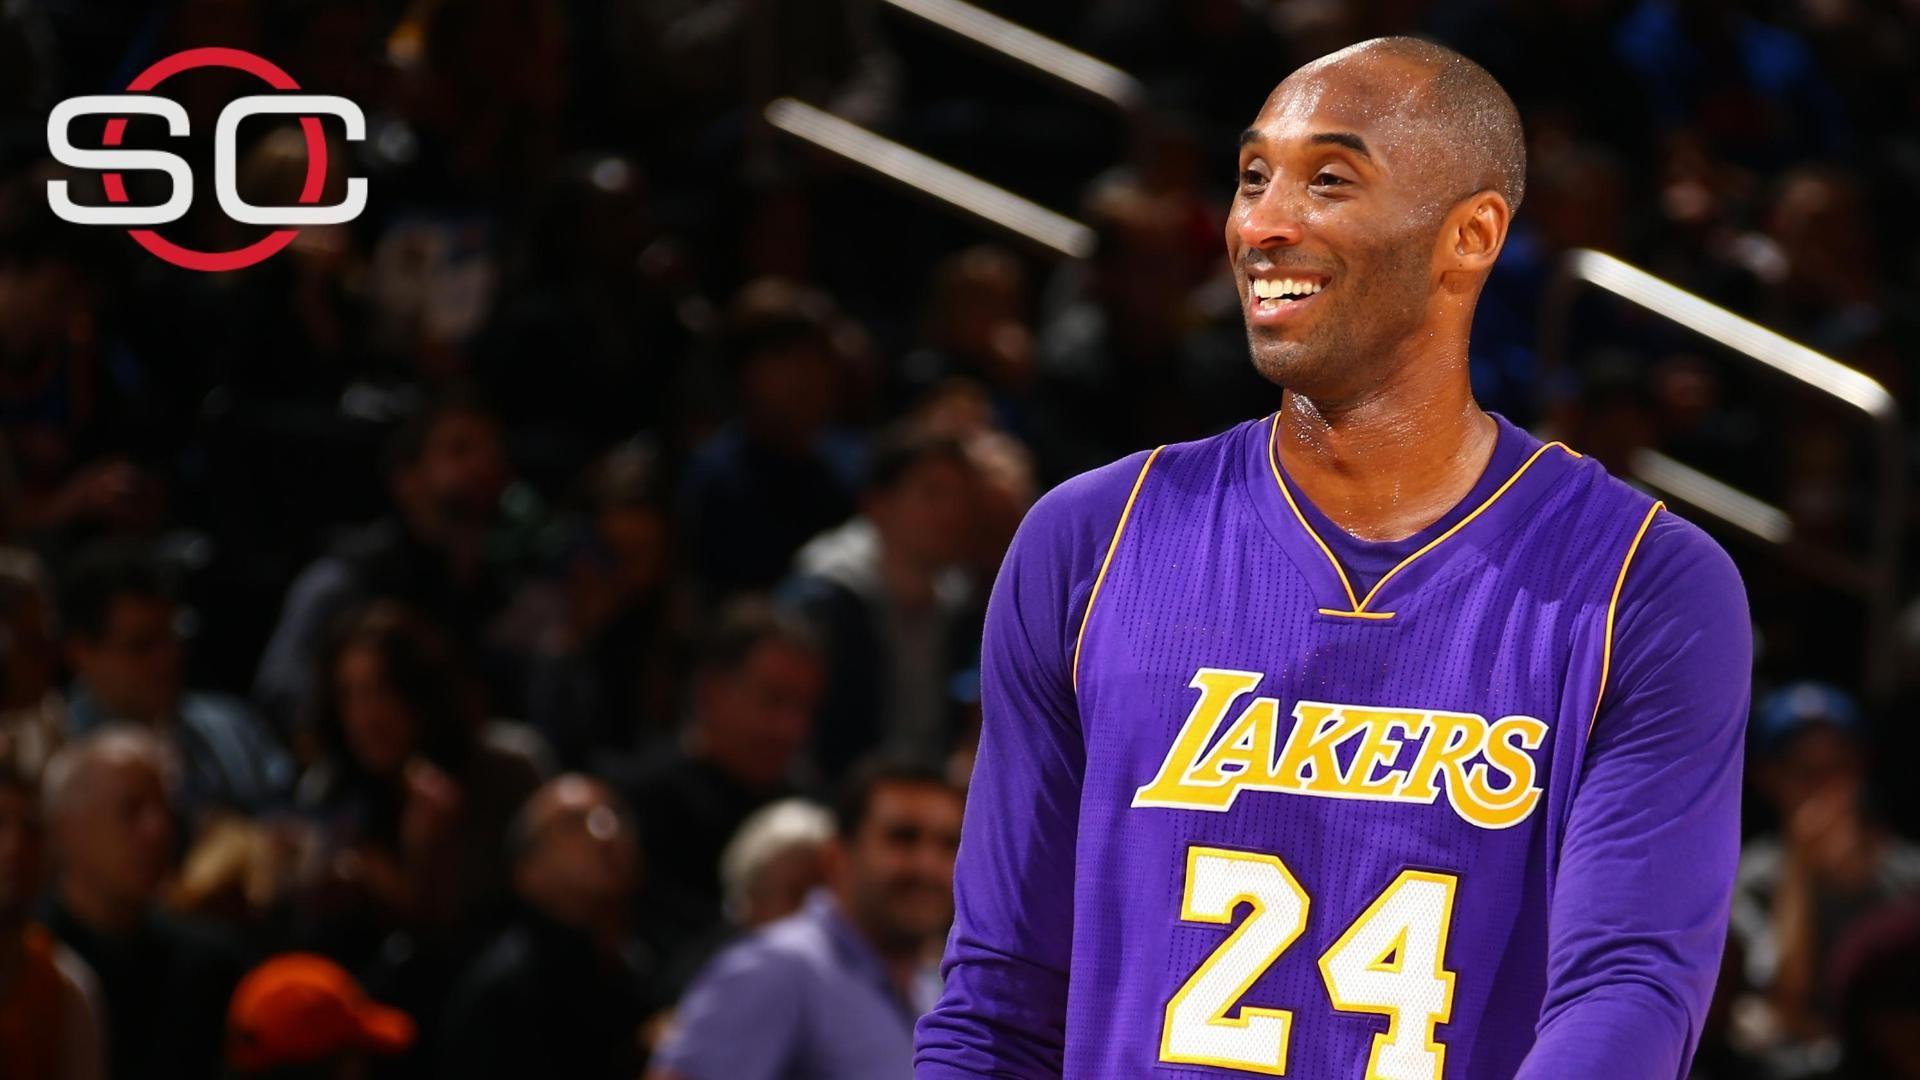 Kobe Bryant announces retirement at end of season